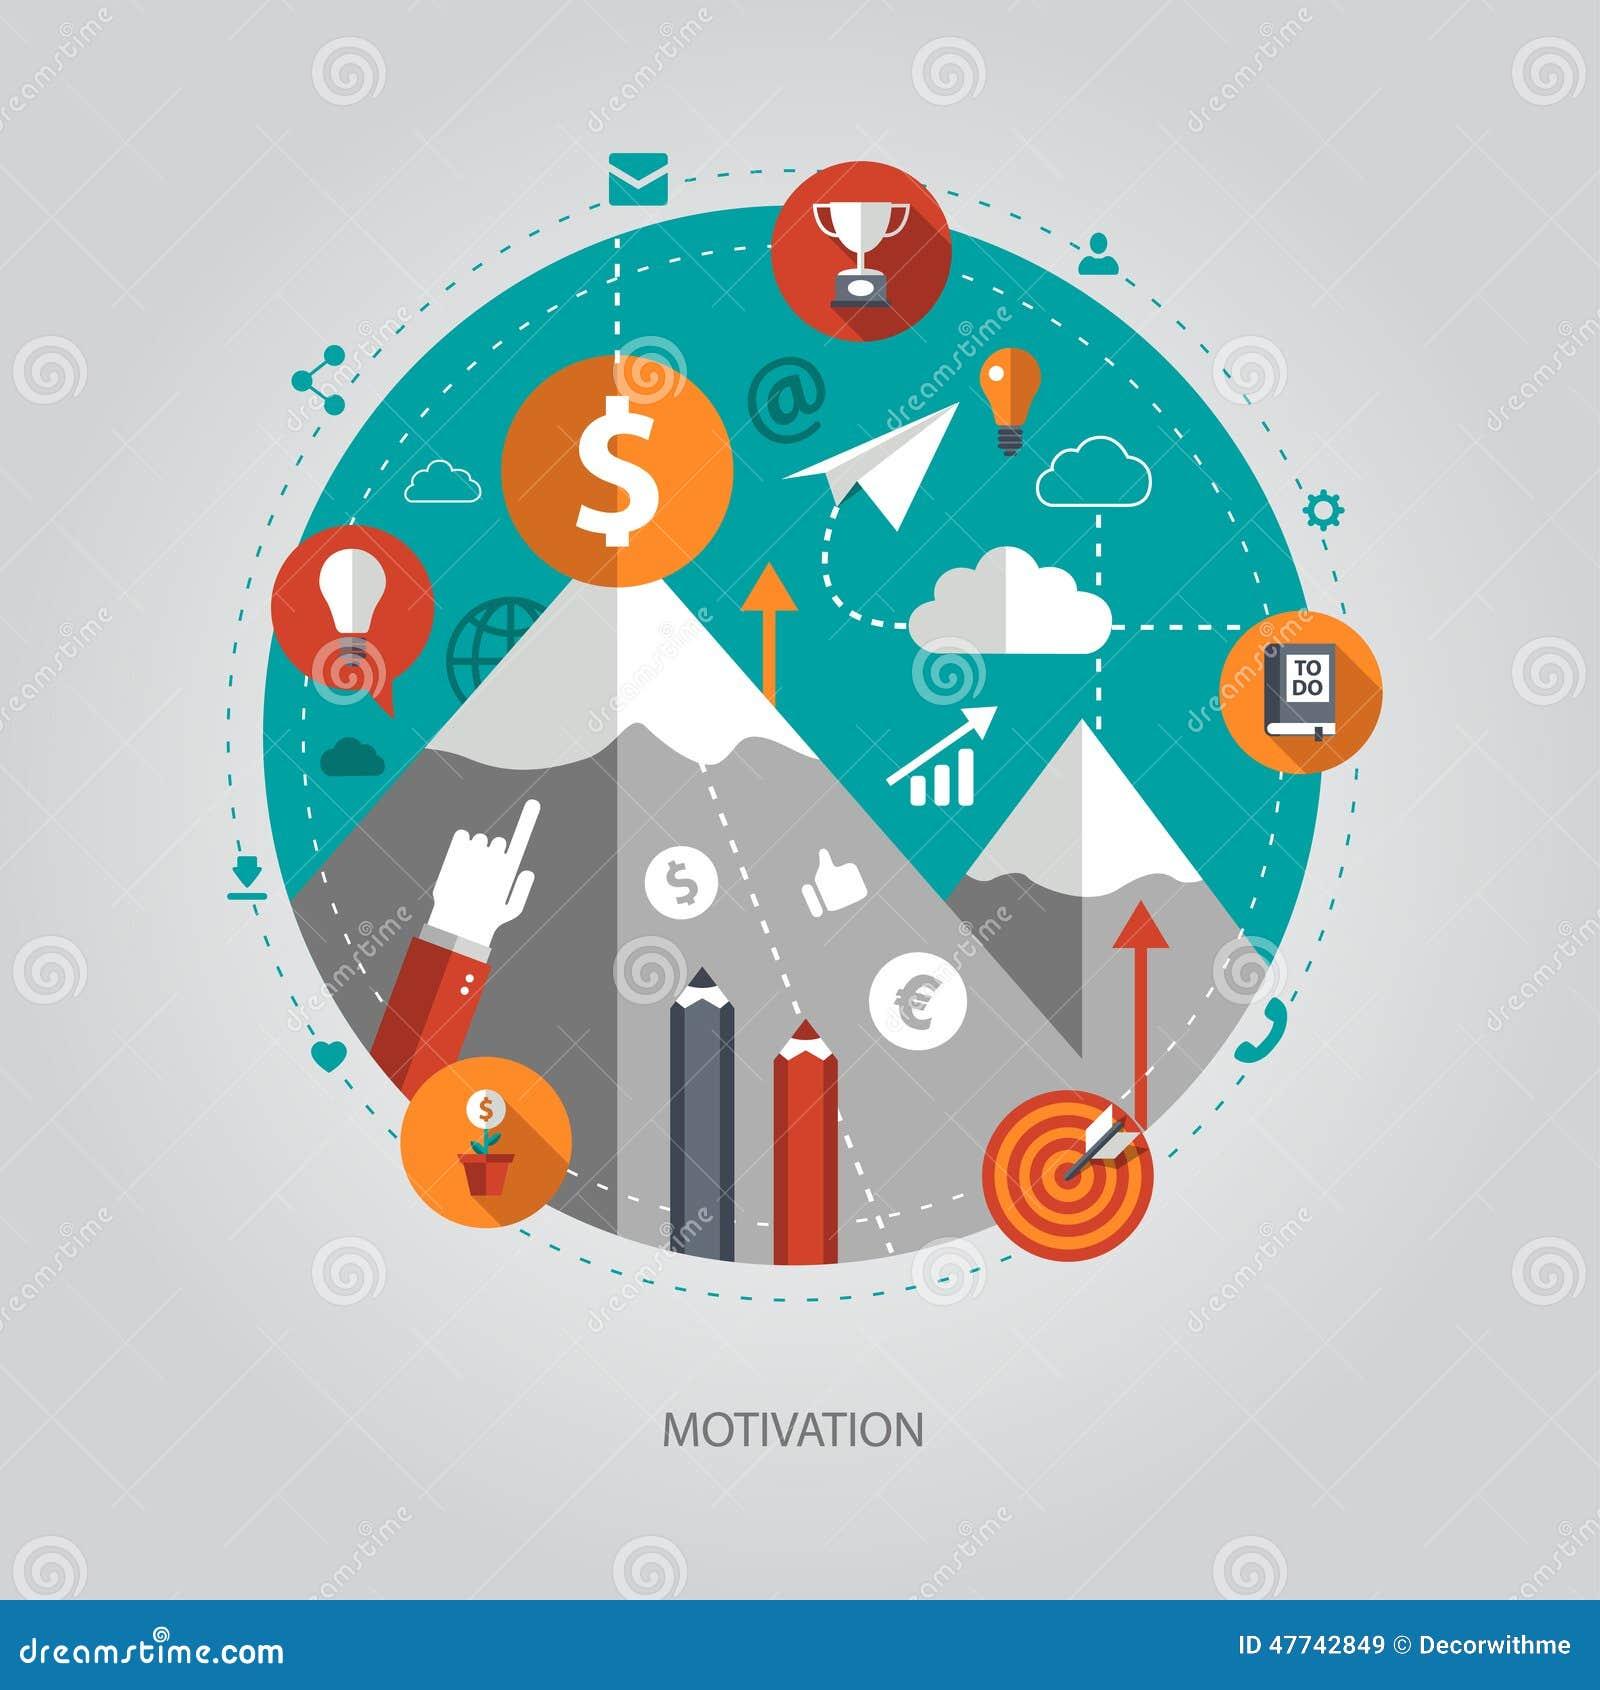 Illustration Of Flat Design Business Illustration Stock Vector - Image ...